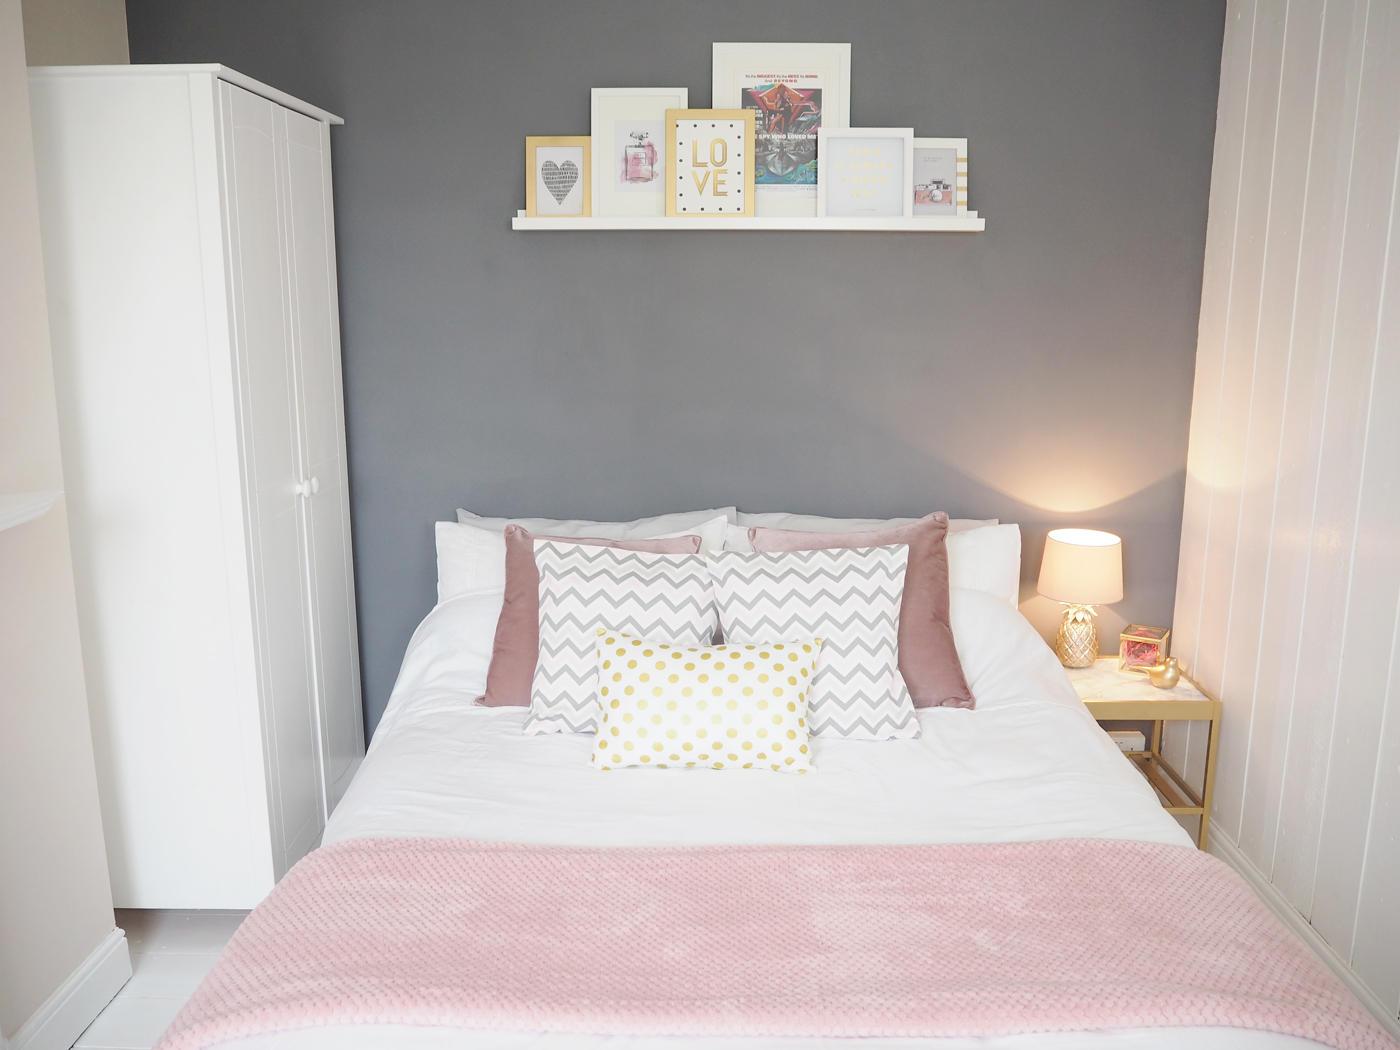 PINK & GREY BEDROOM MAKEOVER